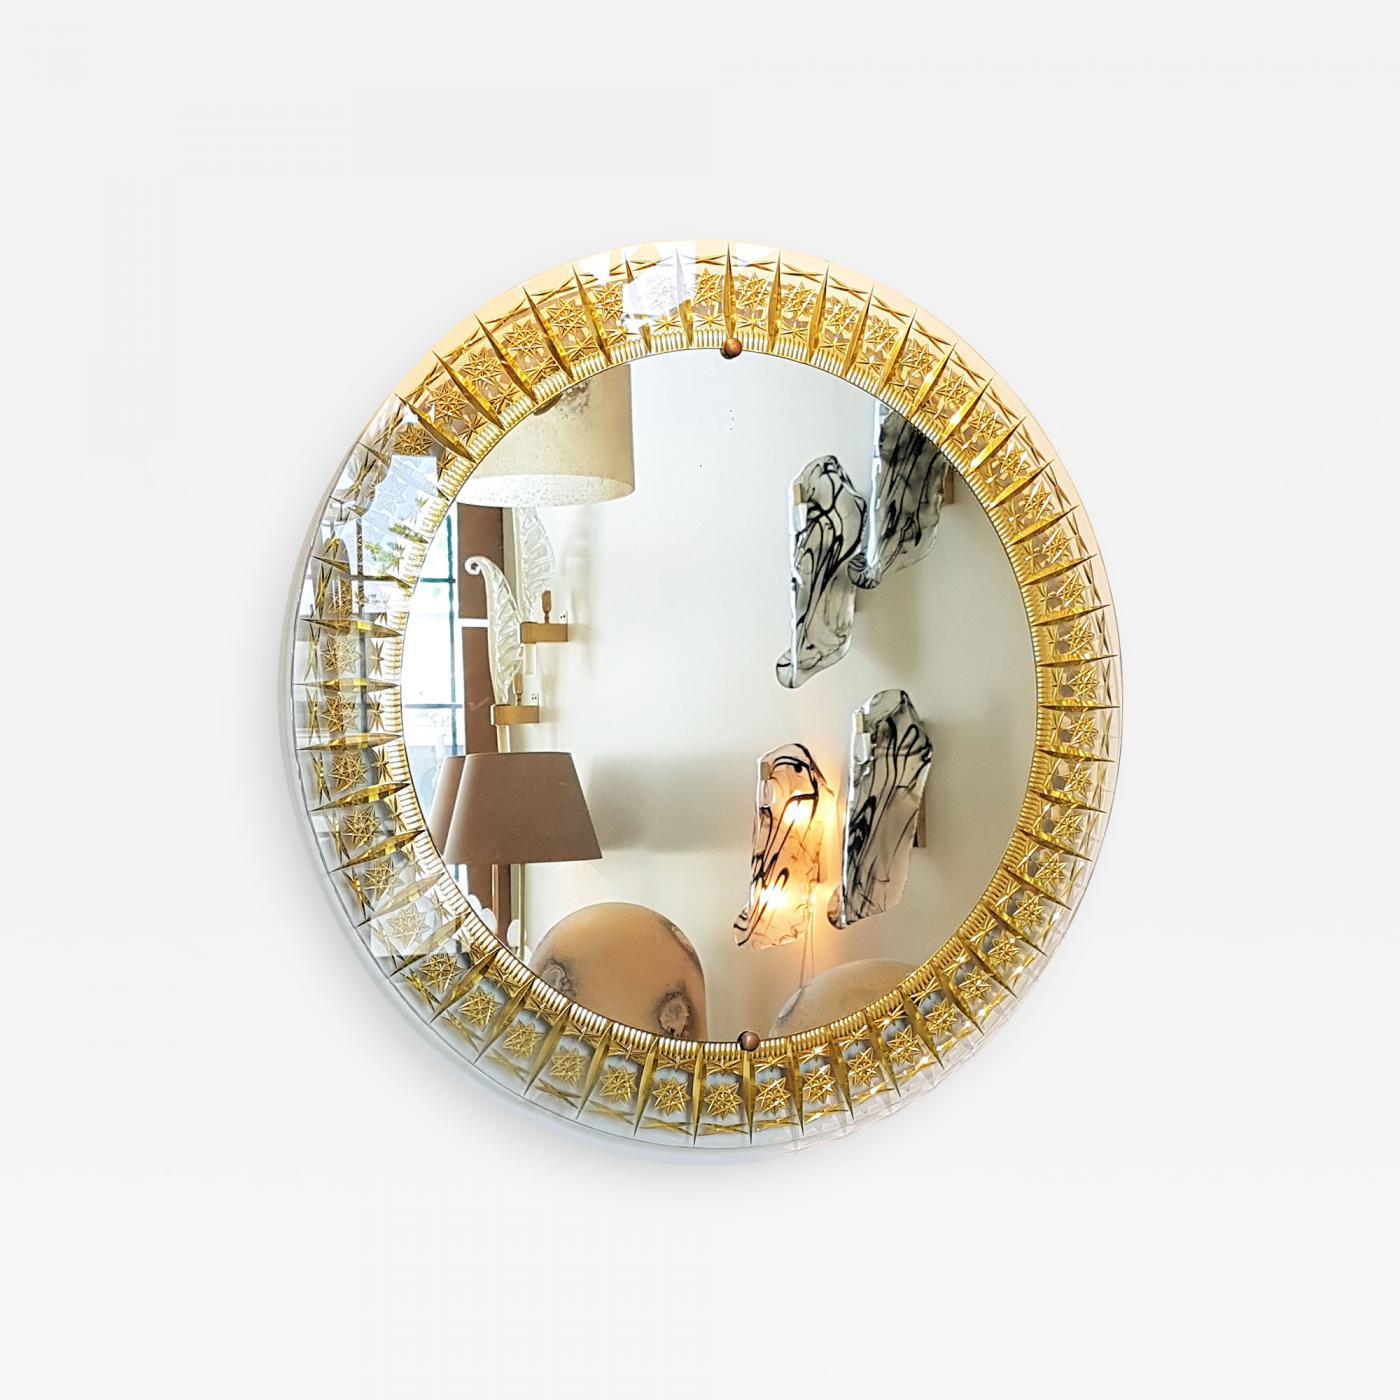 Image of: Cristal Arte Cristal Arte Round Mid Century Modern Mirror Glass Gold Carved Frame